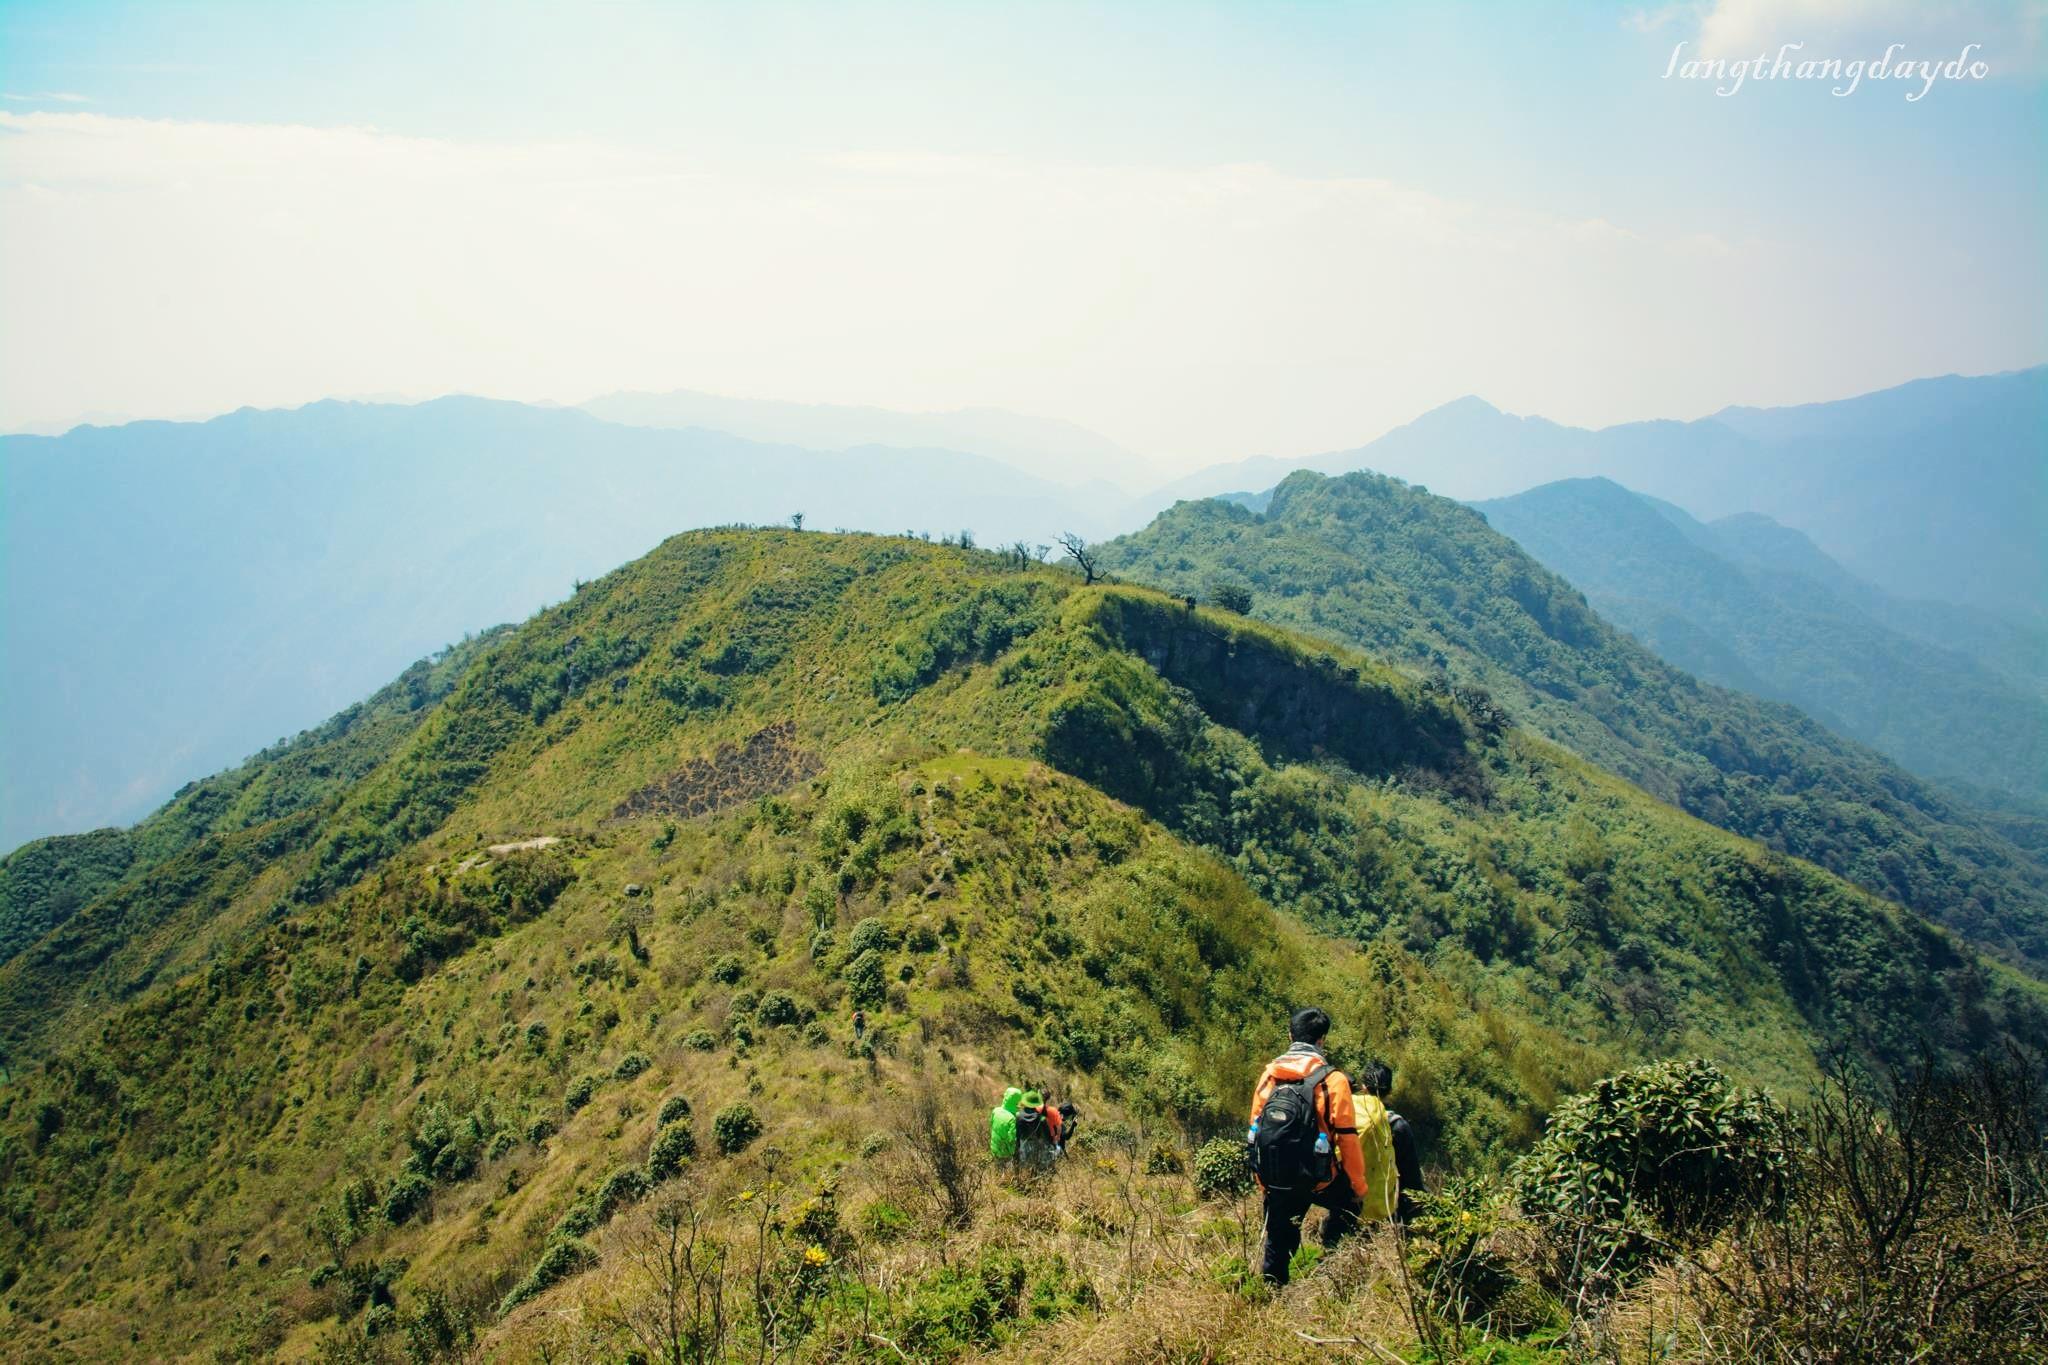 Vietnam natural landscape_Lùng Cúng Mountain